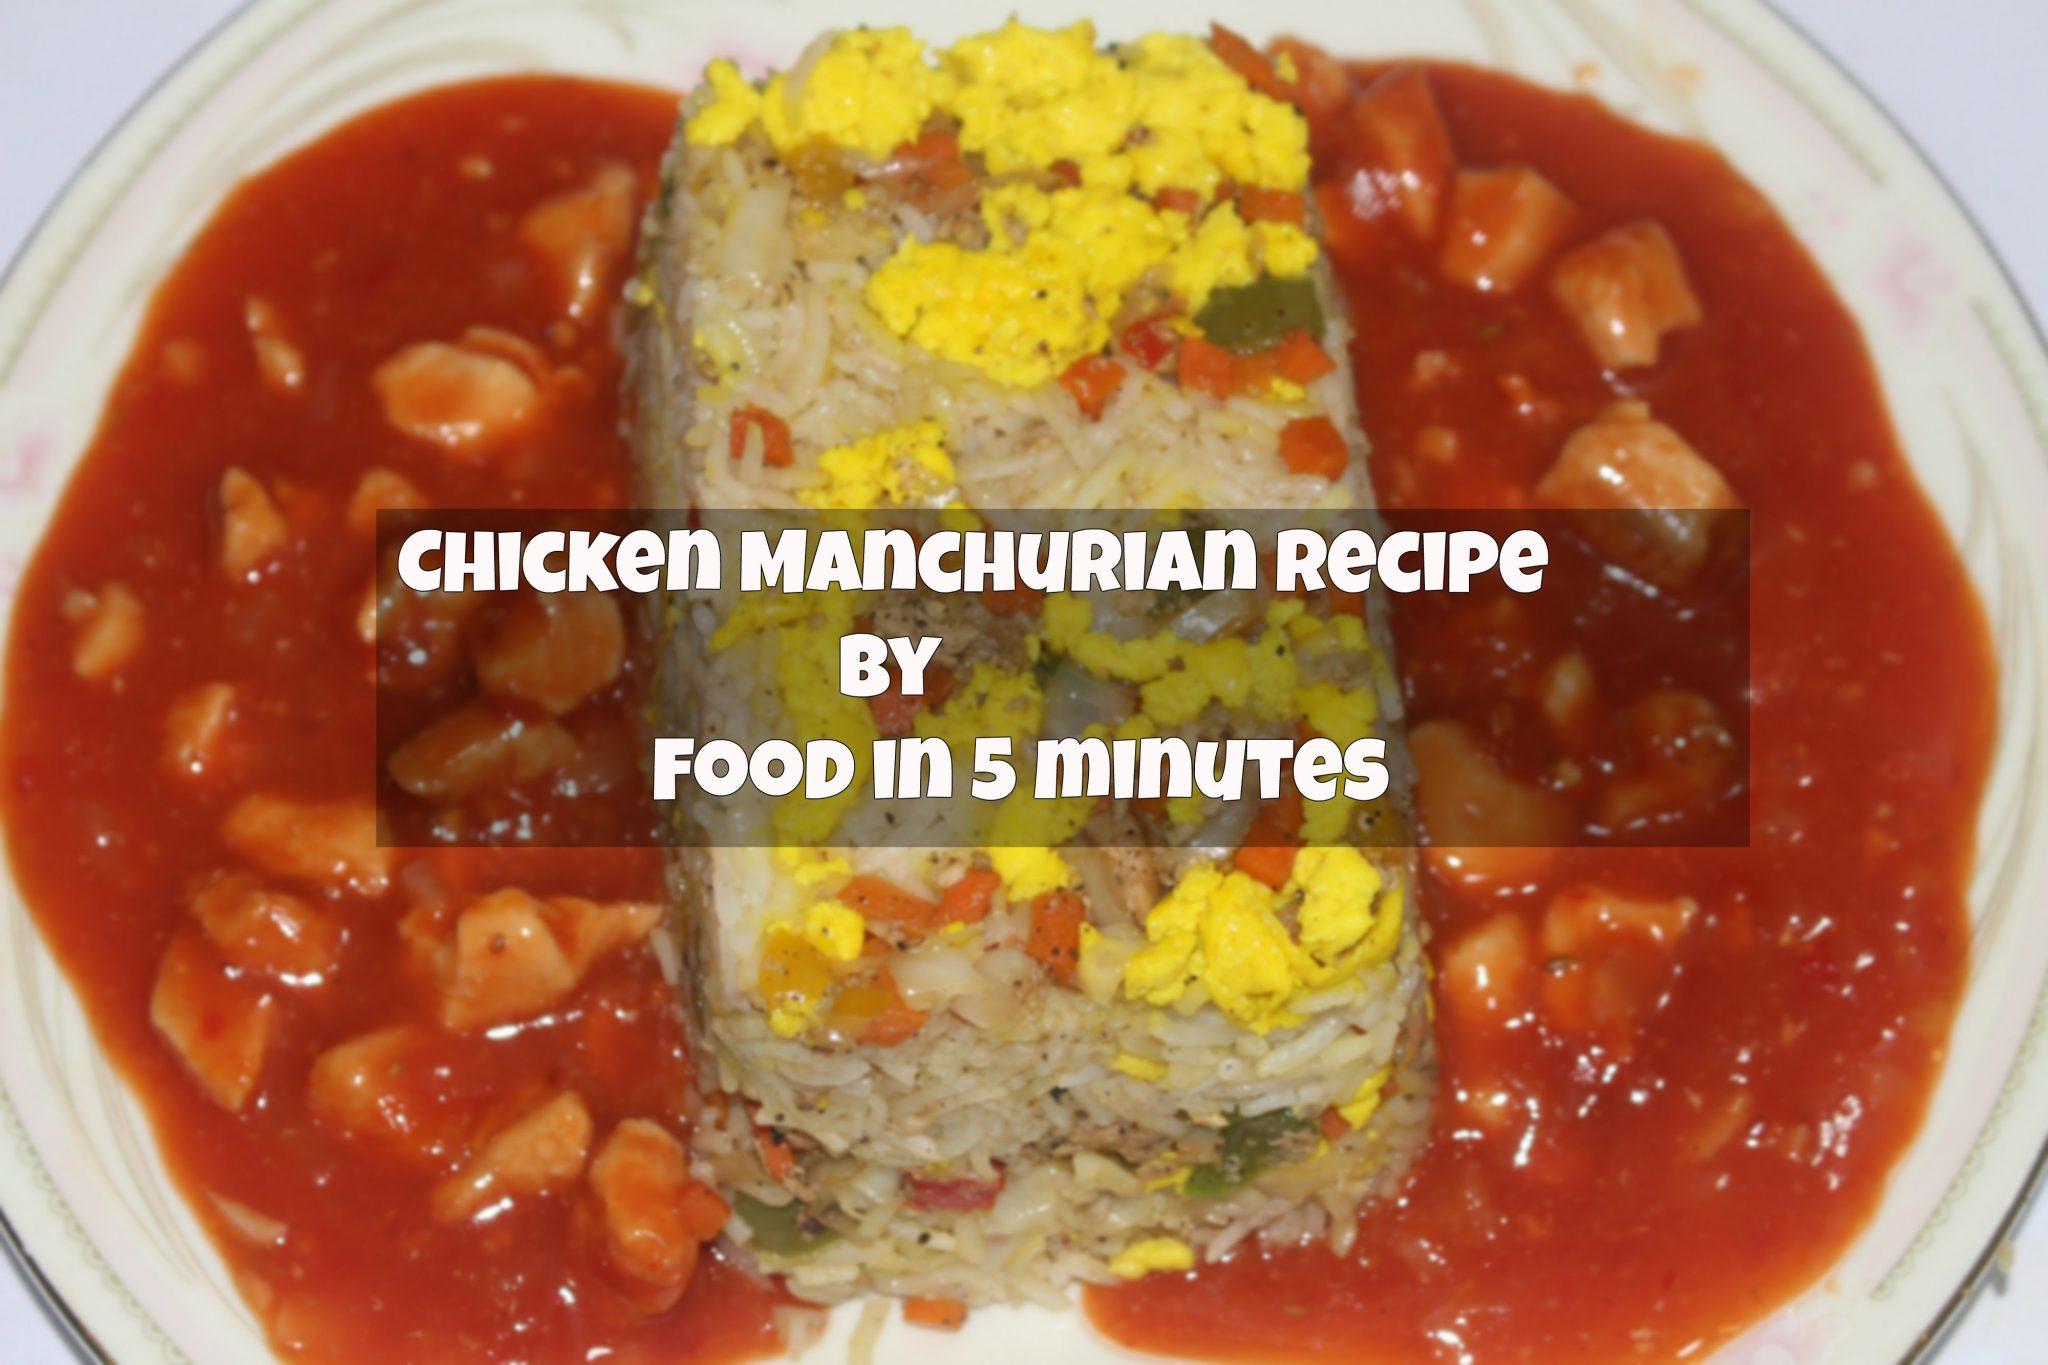 Chicken Manchurian Special Recipe - Pakistani Recipe ( چکن منچورین) Manchurian - Easy To Make!